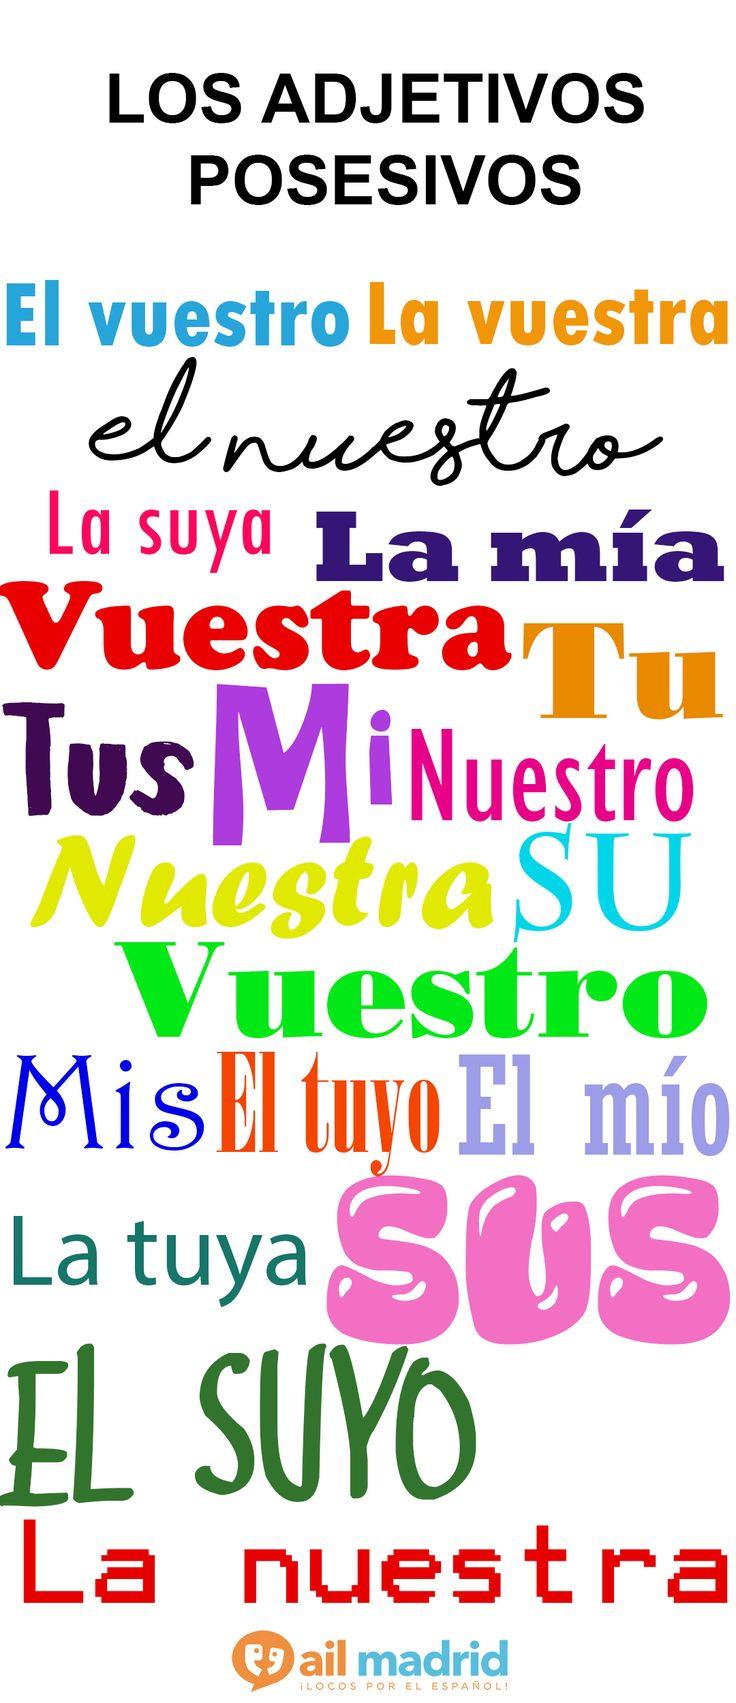 Learn Spanish Grammar: Listening Activity for Adjectives